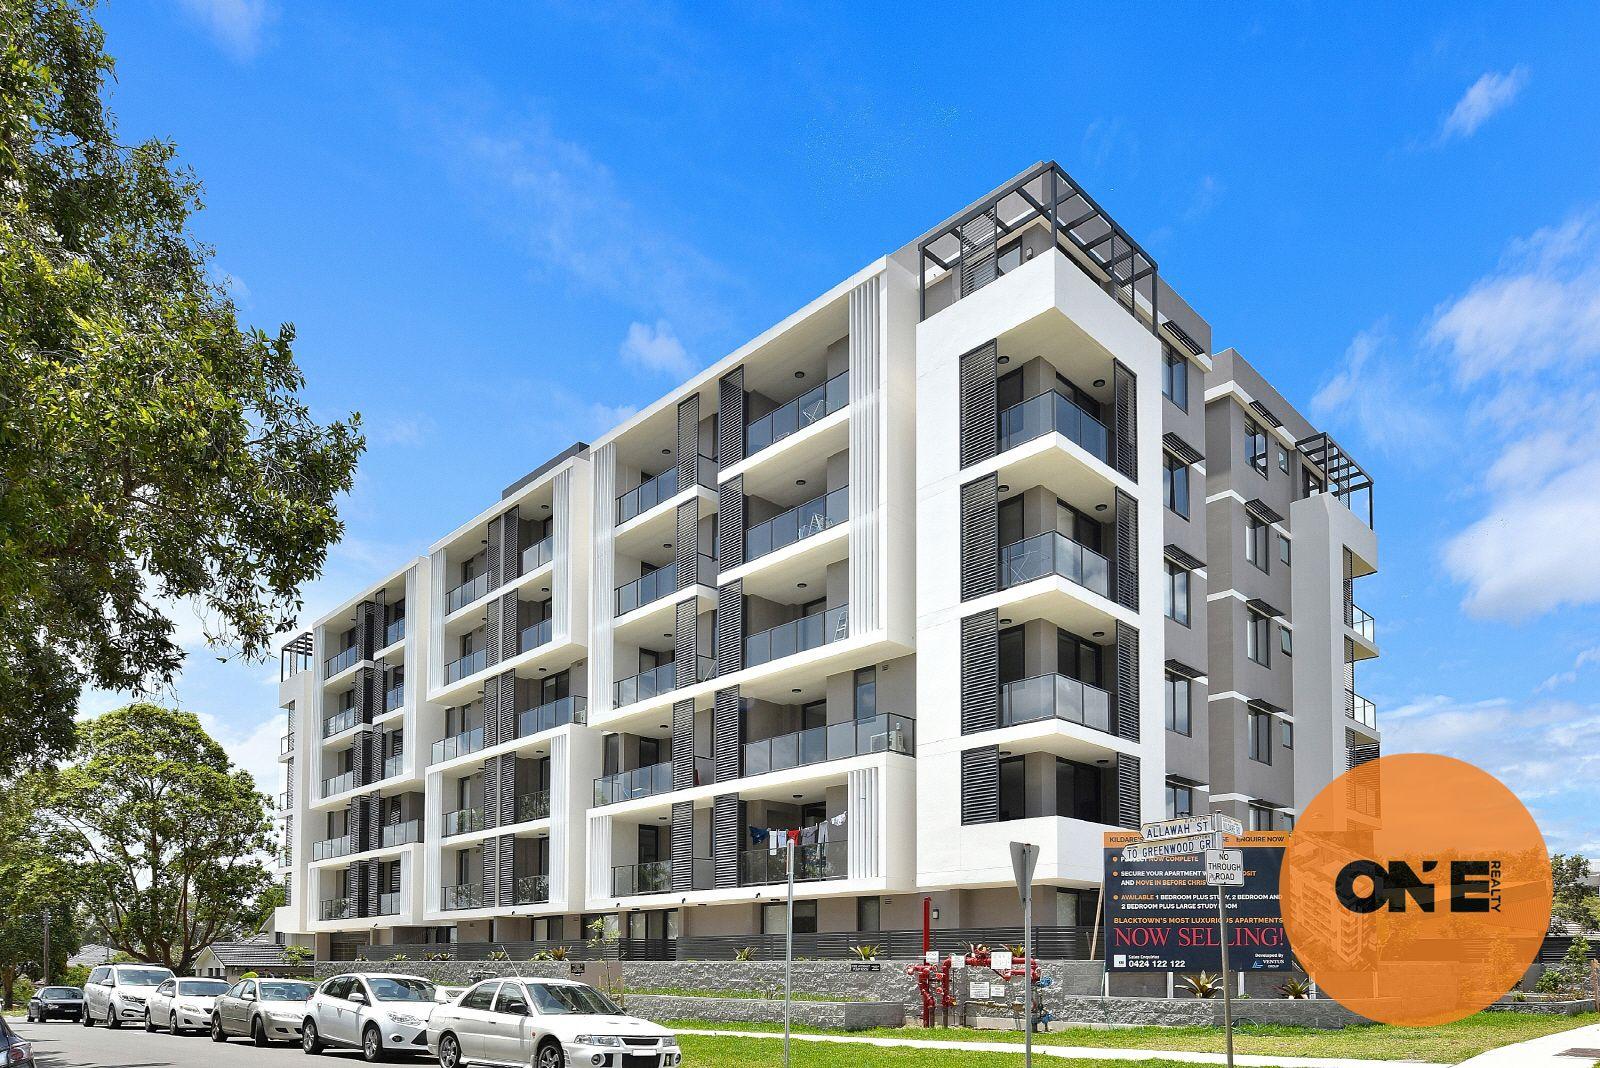 301/51-53 Kildare Rd, Blacktown NSW 2148, Image 0